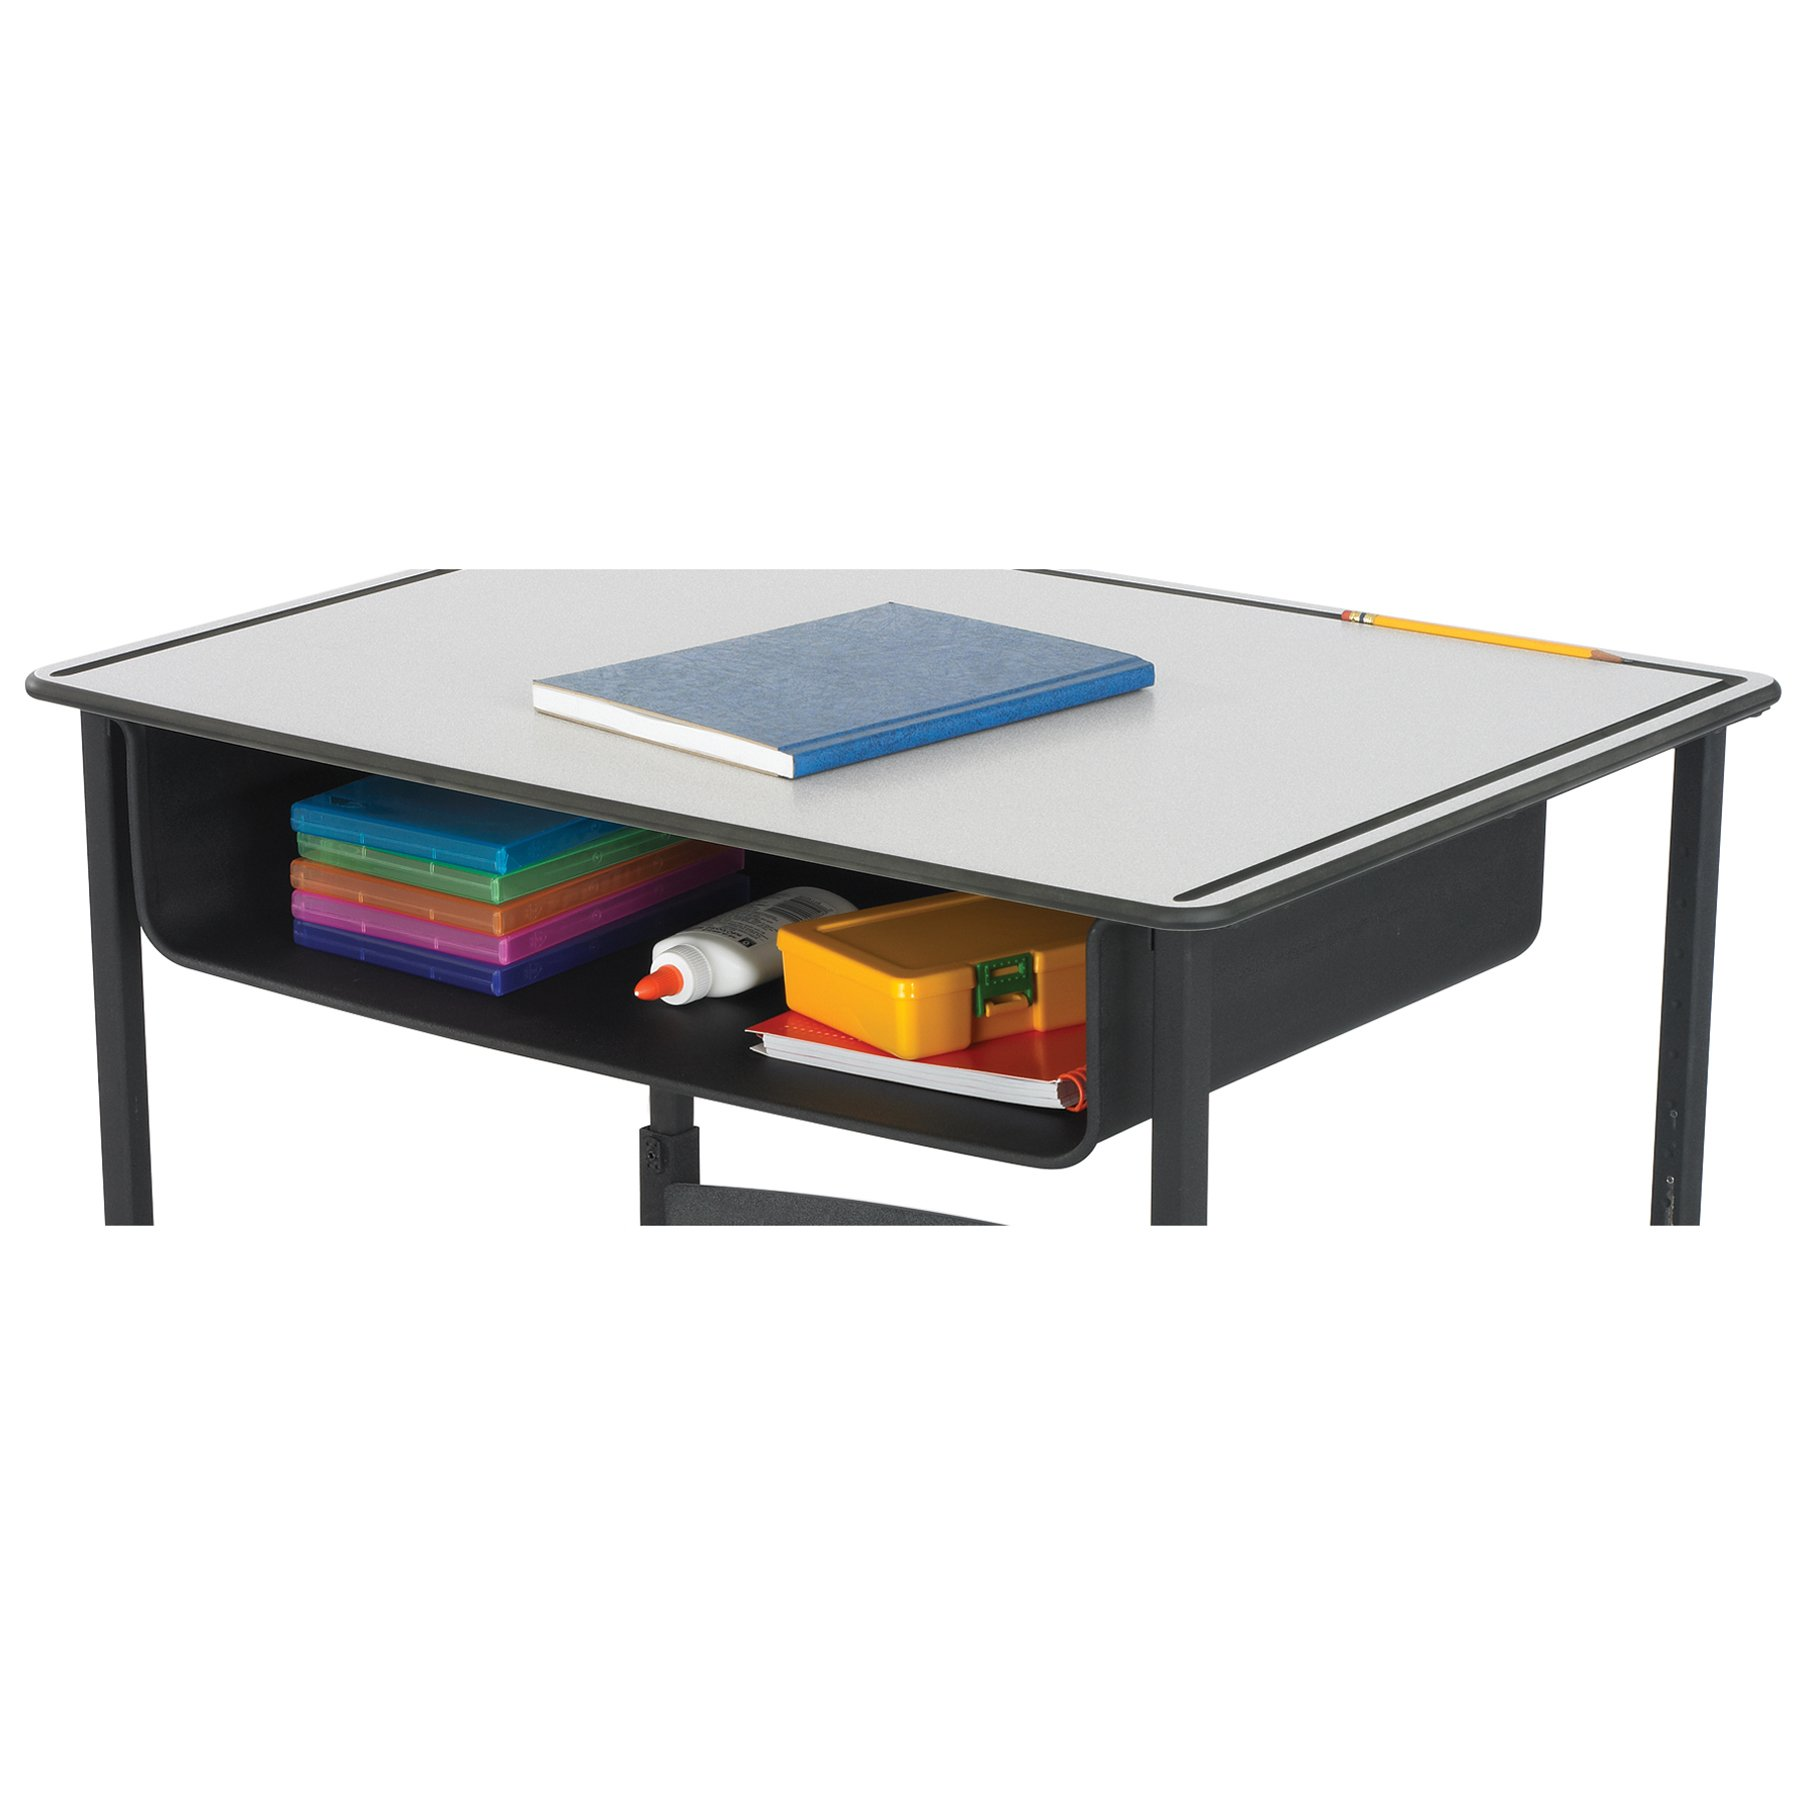 Safco Products 1212BL Book Box for AlphaBetter Desk, Black